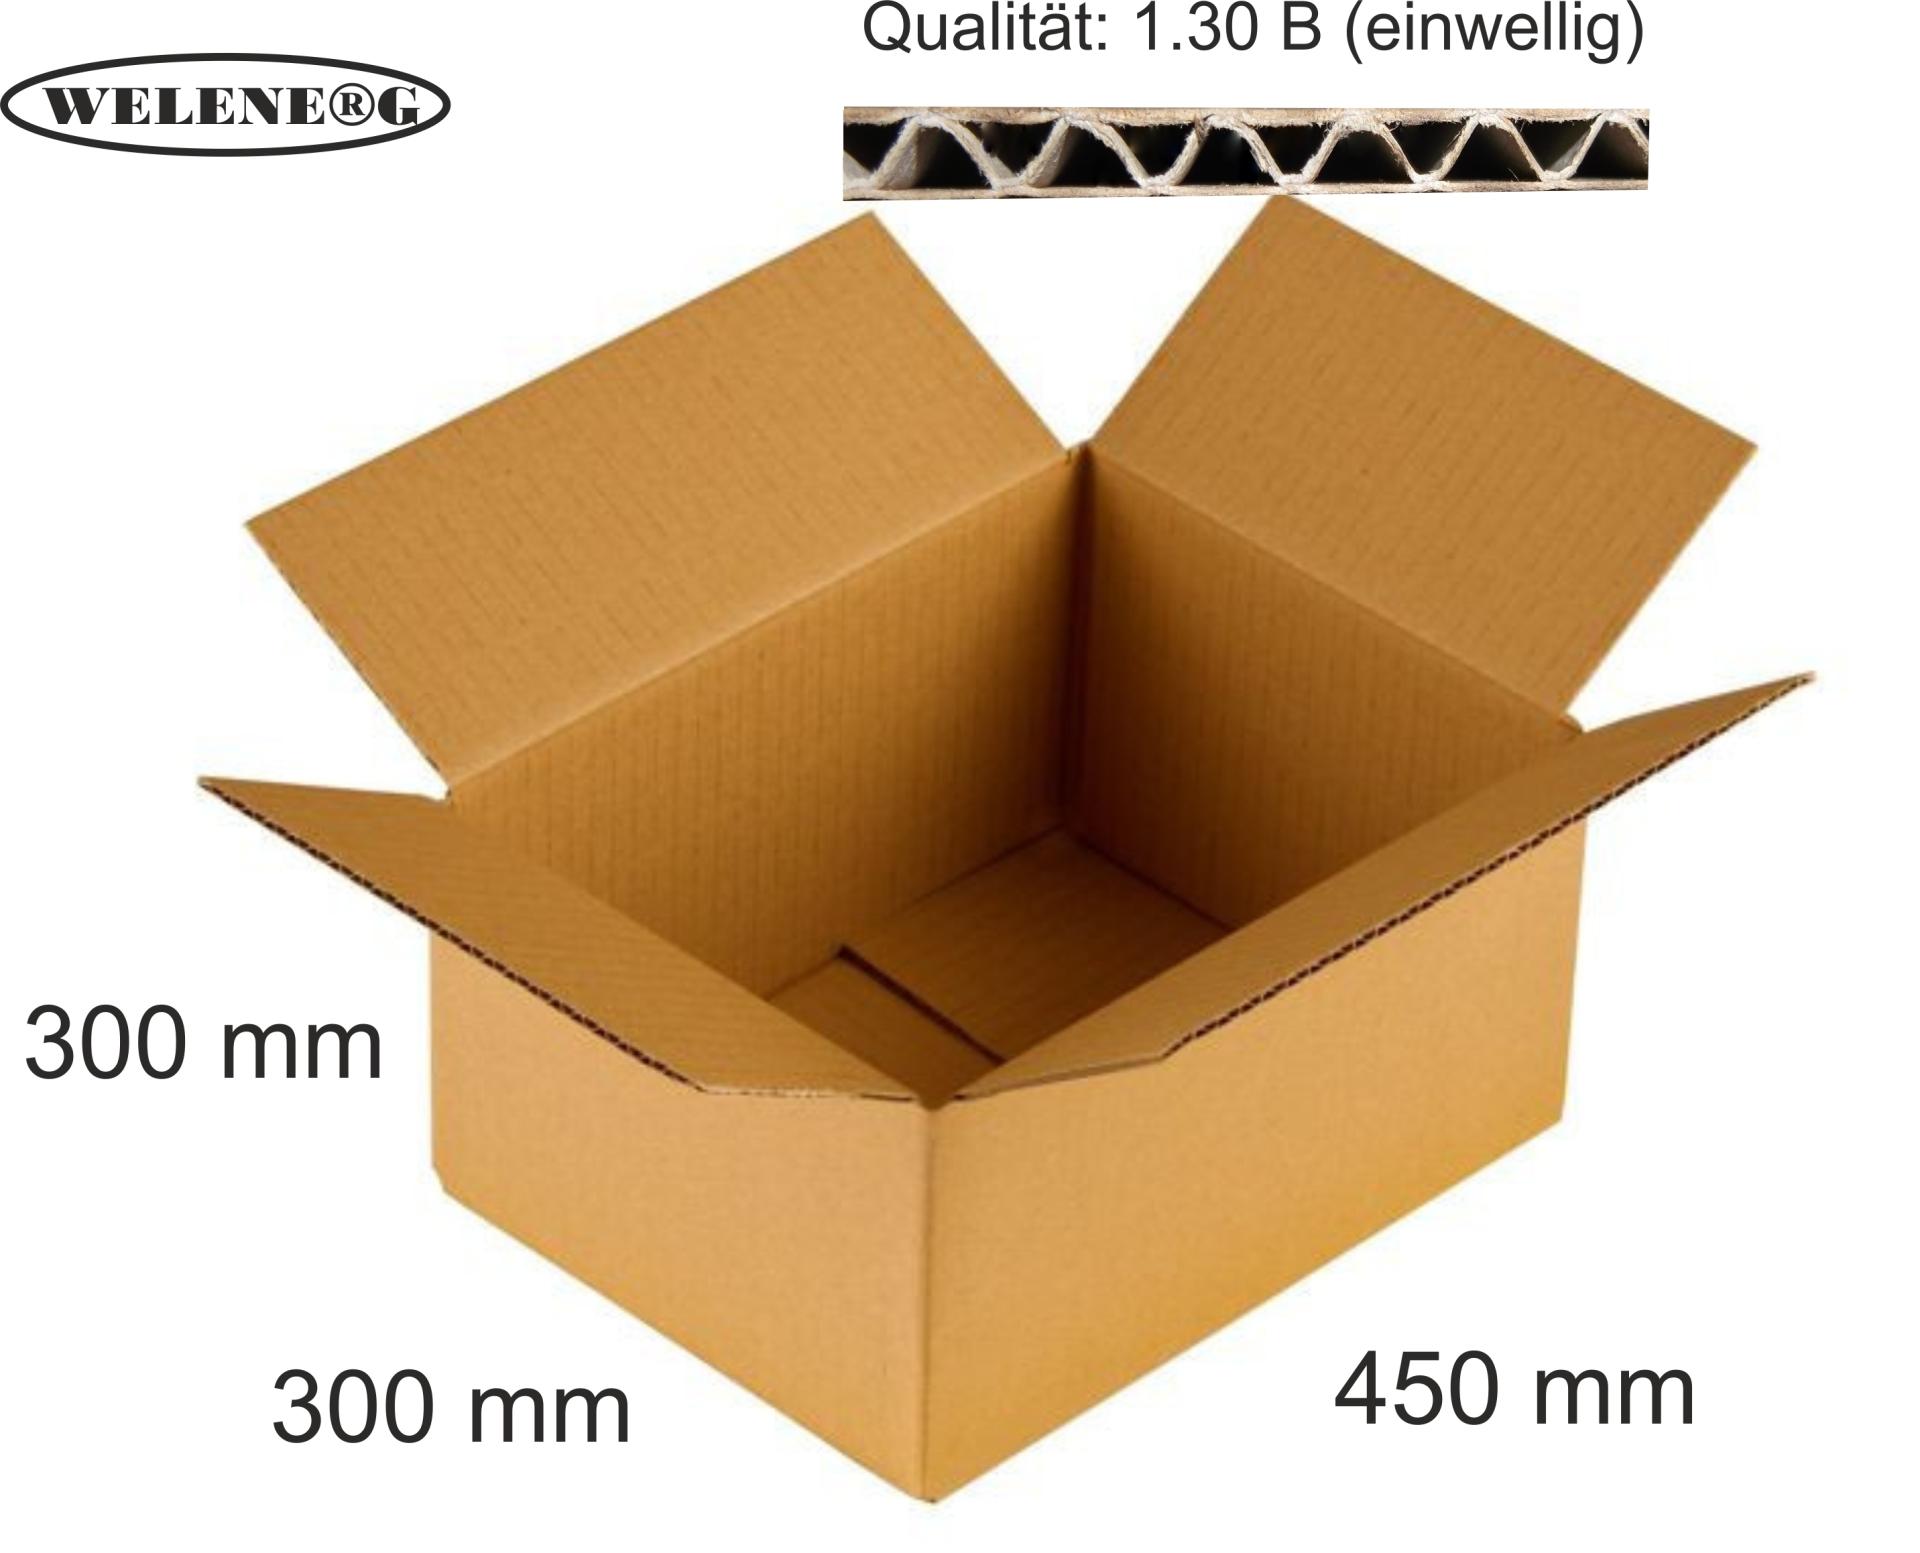 40 Faltkartons 450x300x300 mm B-410g//m2  Versandkarton Falt Kartons BRAUN